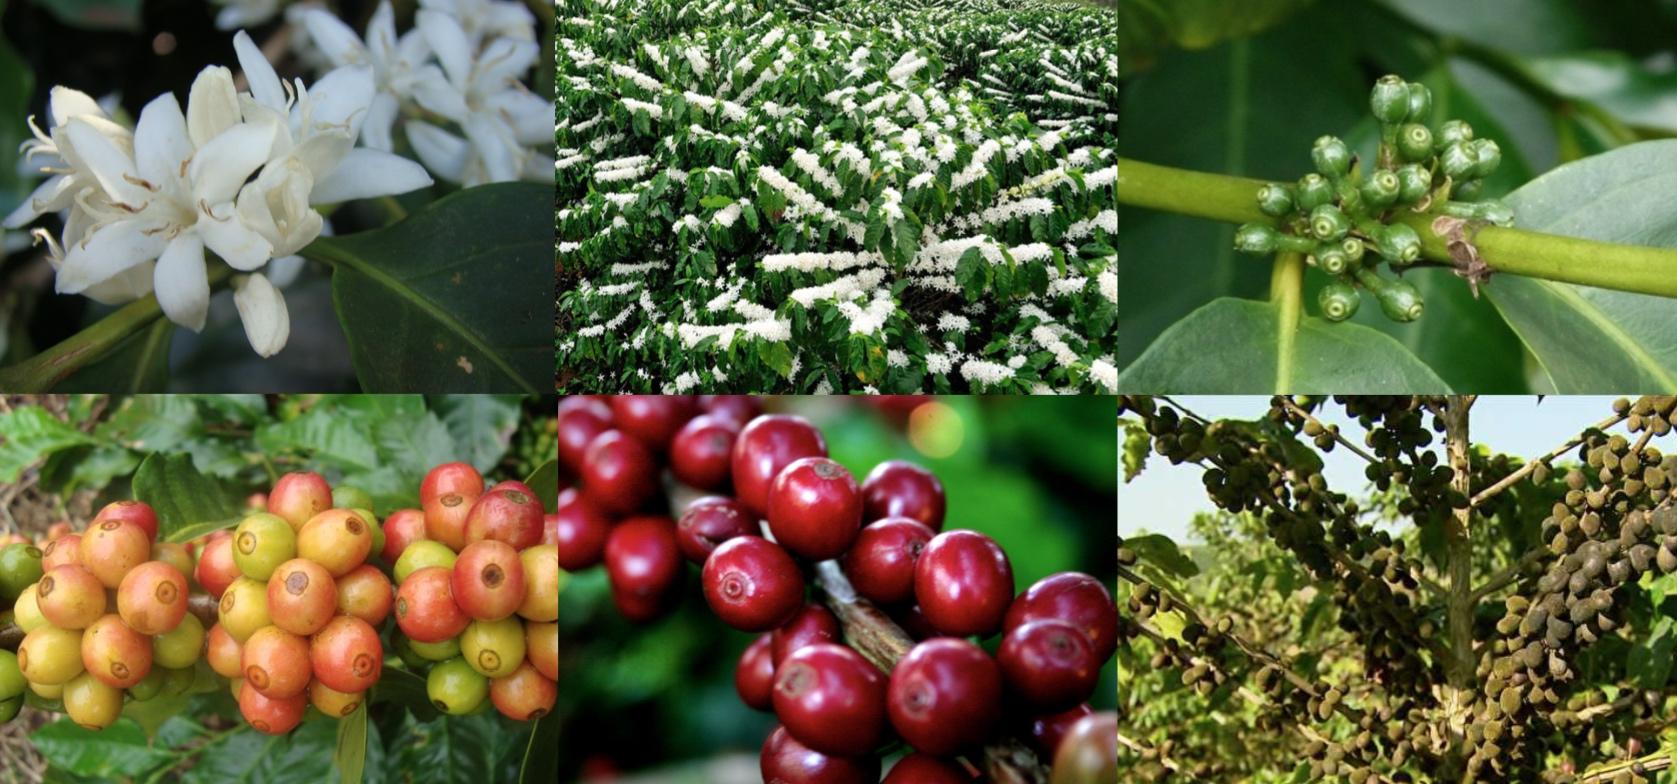 Passos que o fruto do café leva para se desenvolver